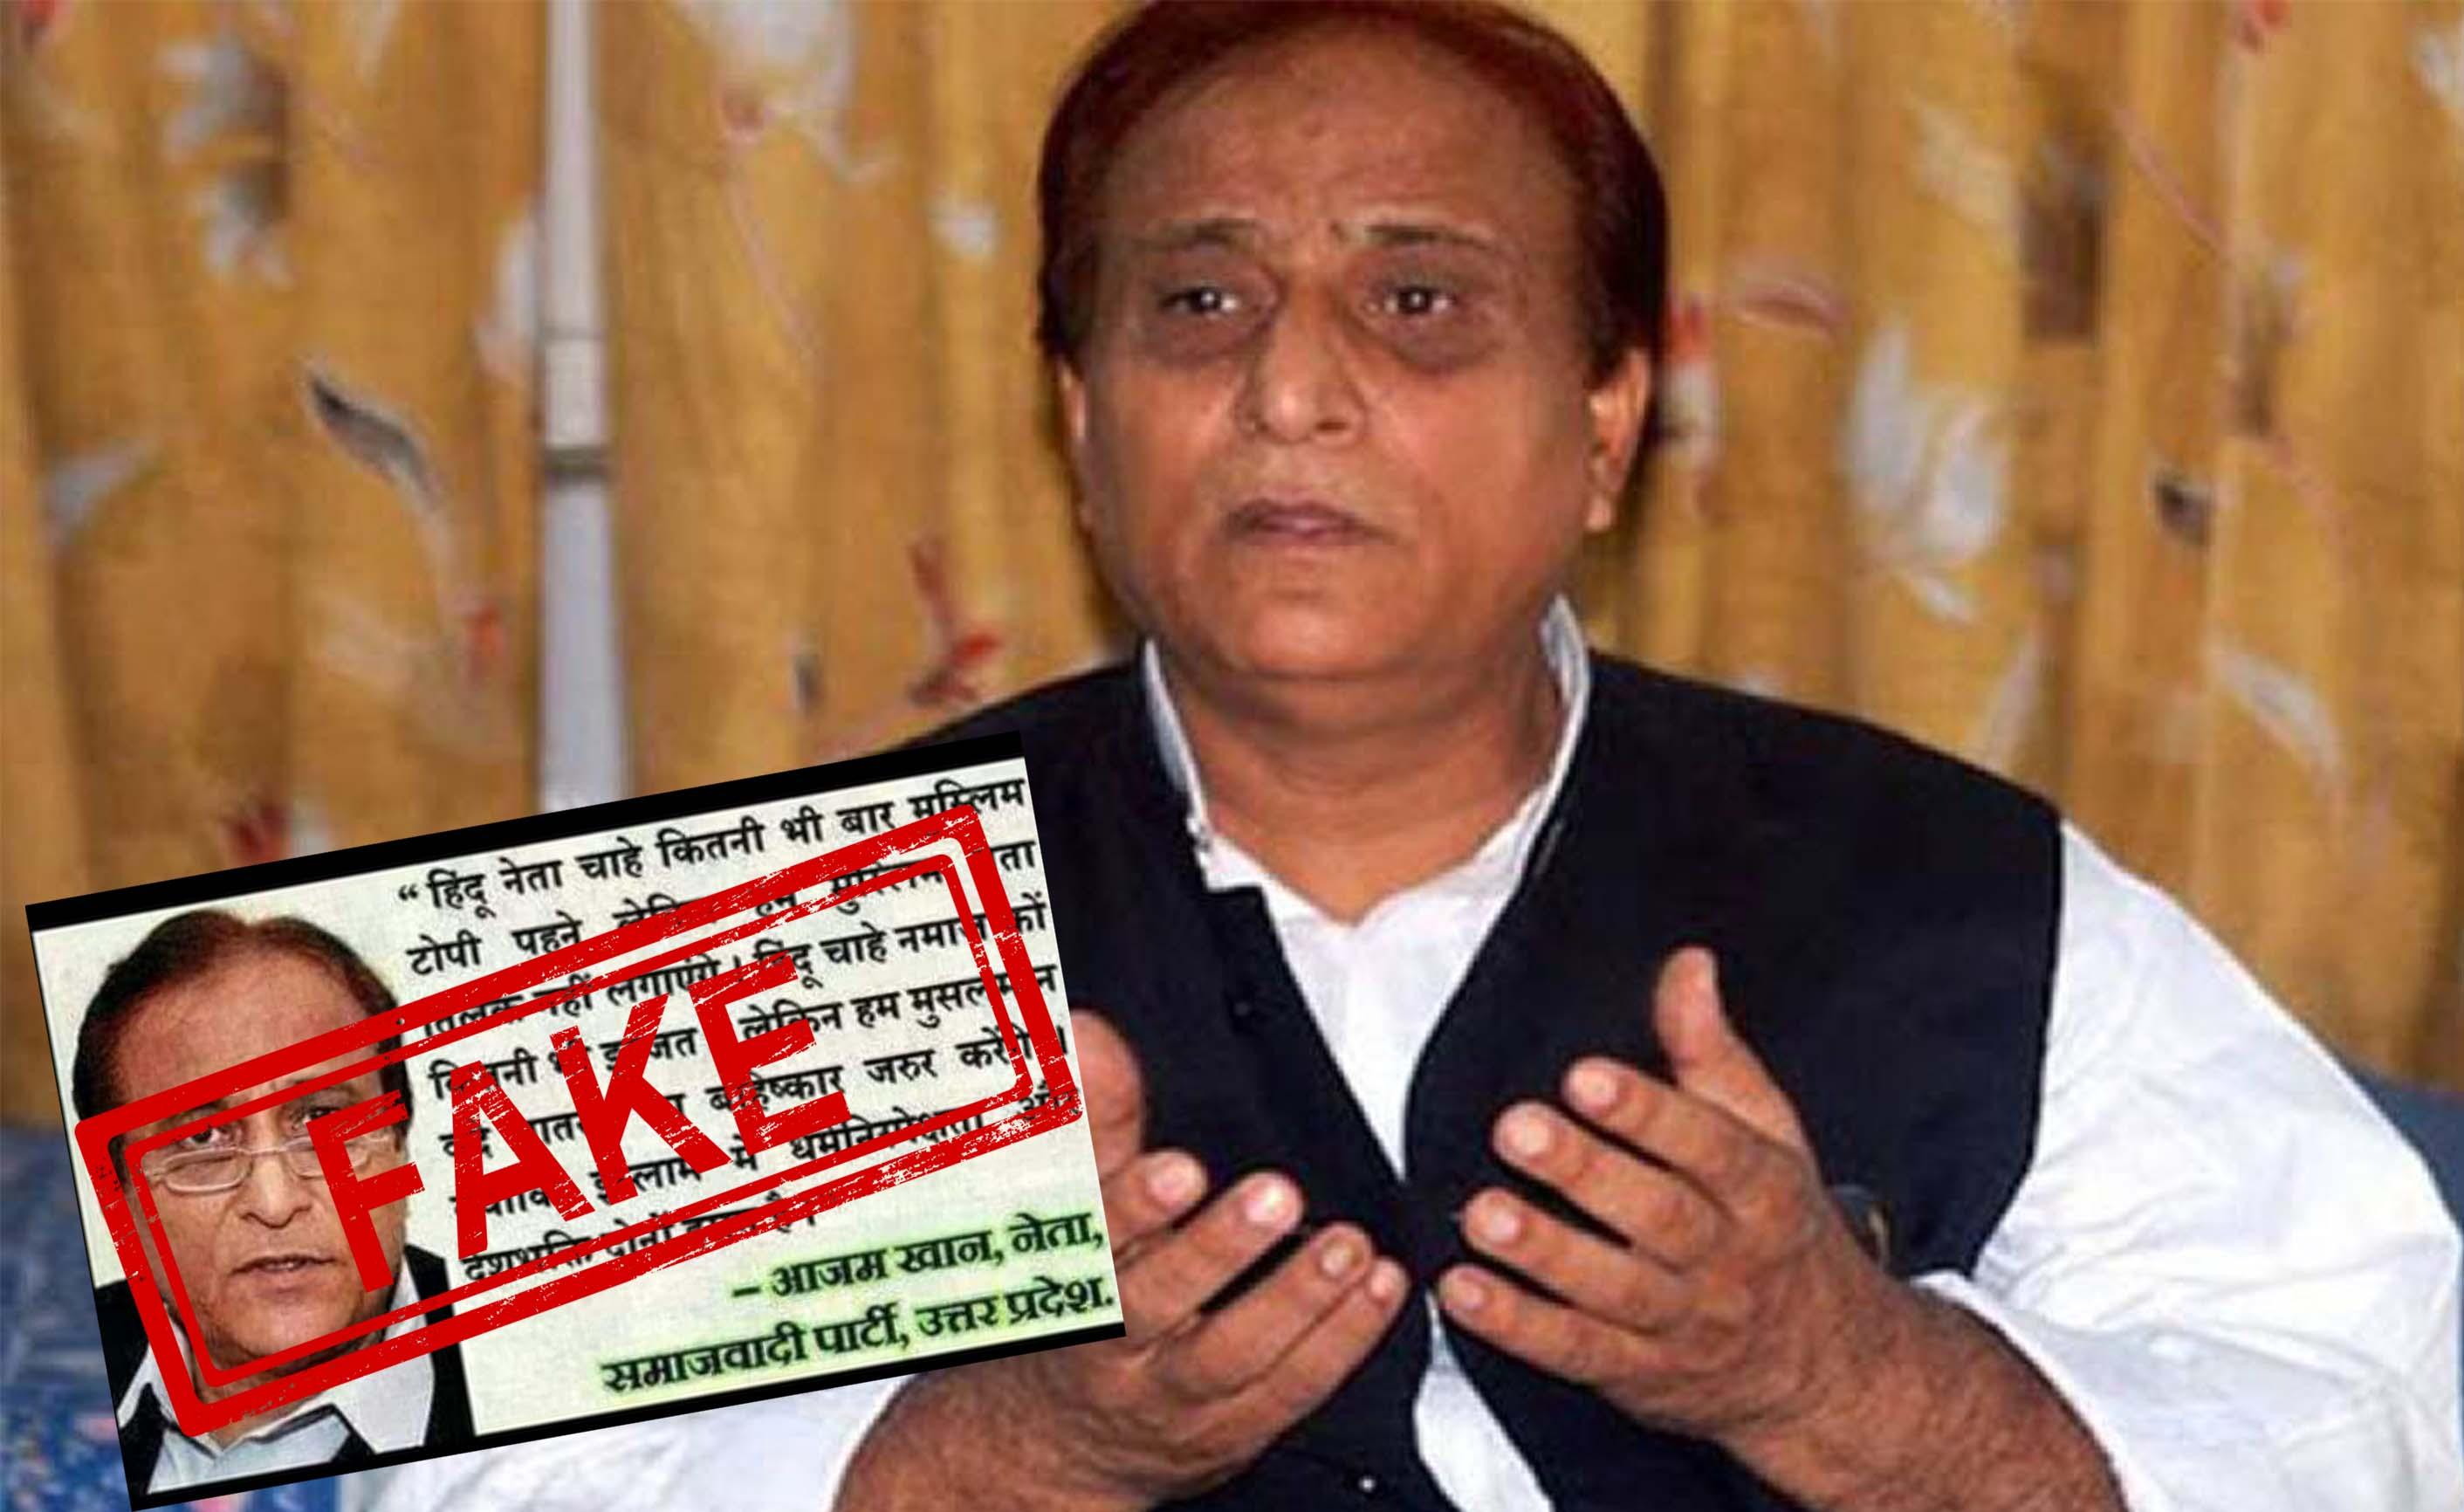 Azam Khan, Hindu, Muslim, Statement, Uttar Pradesh, Samajwadi Party, NMFC, NewsMobile, Mobile, News, India, Fact Check, Fact Checker, Fake, news